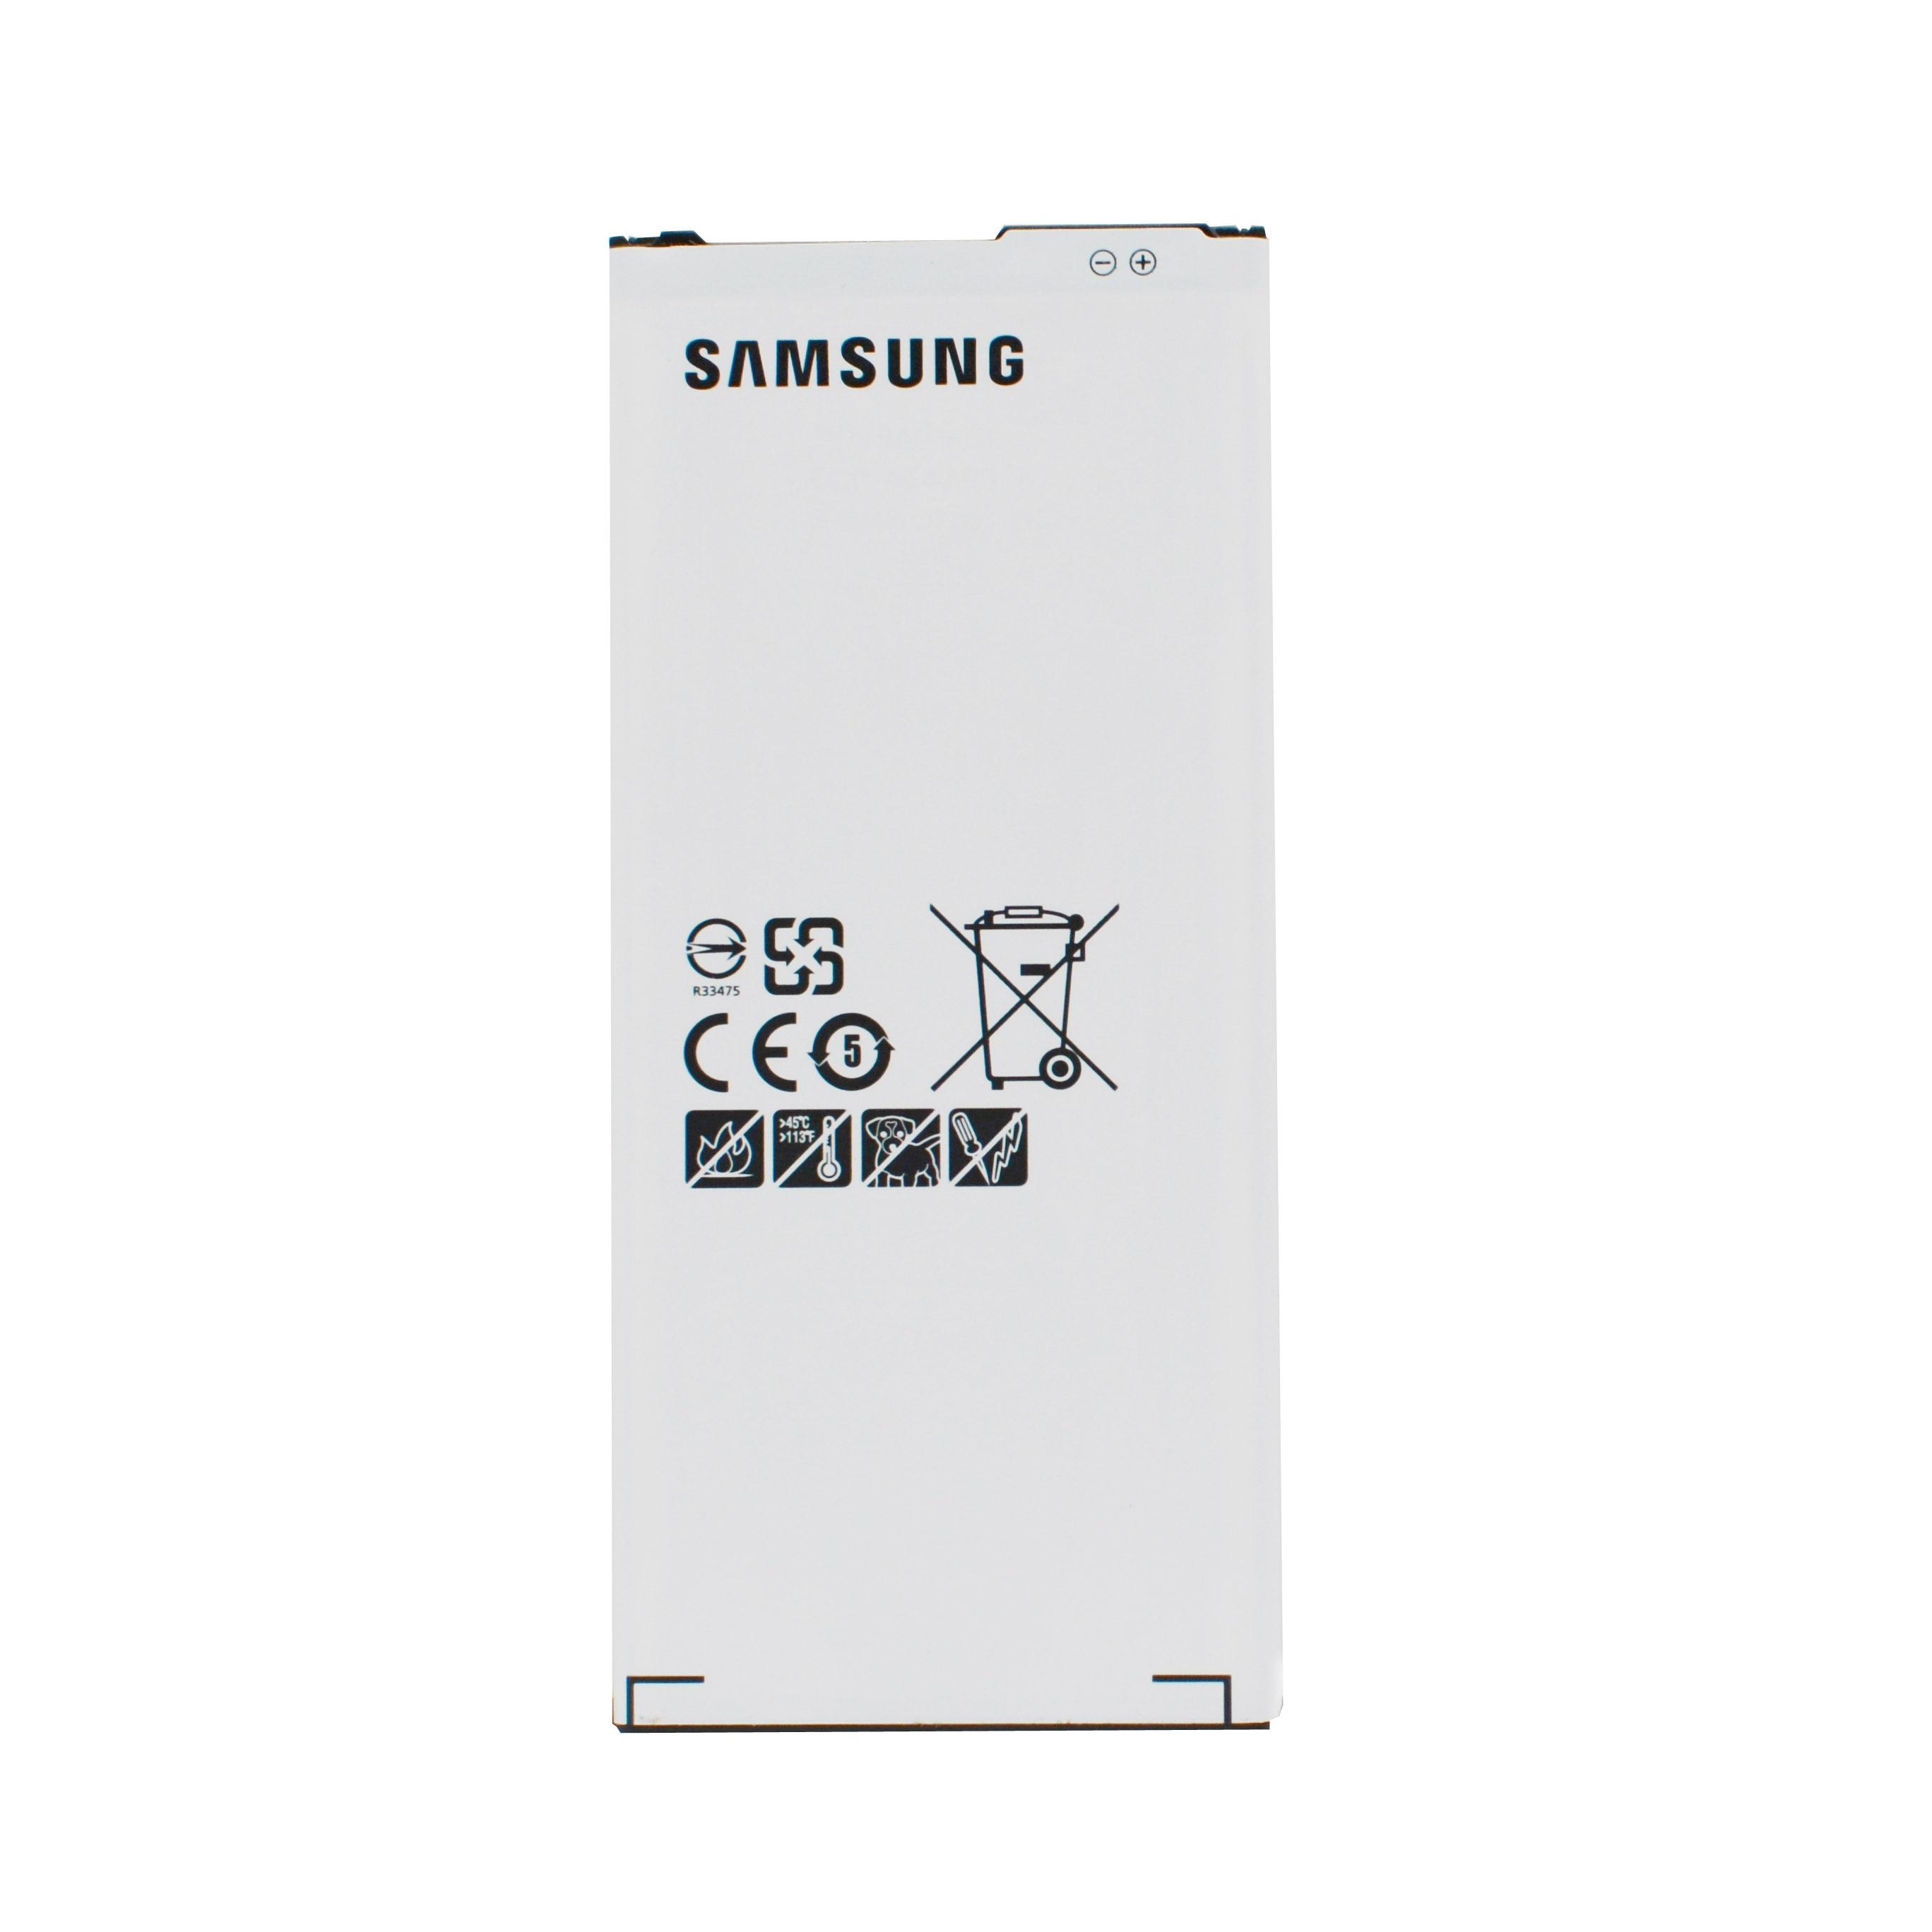 20pcs/lot High Quality Battery EB-BA510ABE For Samsung Galaxy A3 2016/ A5 2016 A310 A310F A510 A510F Phone Batteries 2900mAh enlarge